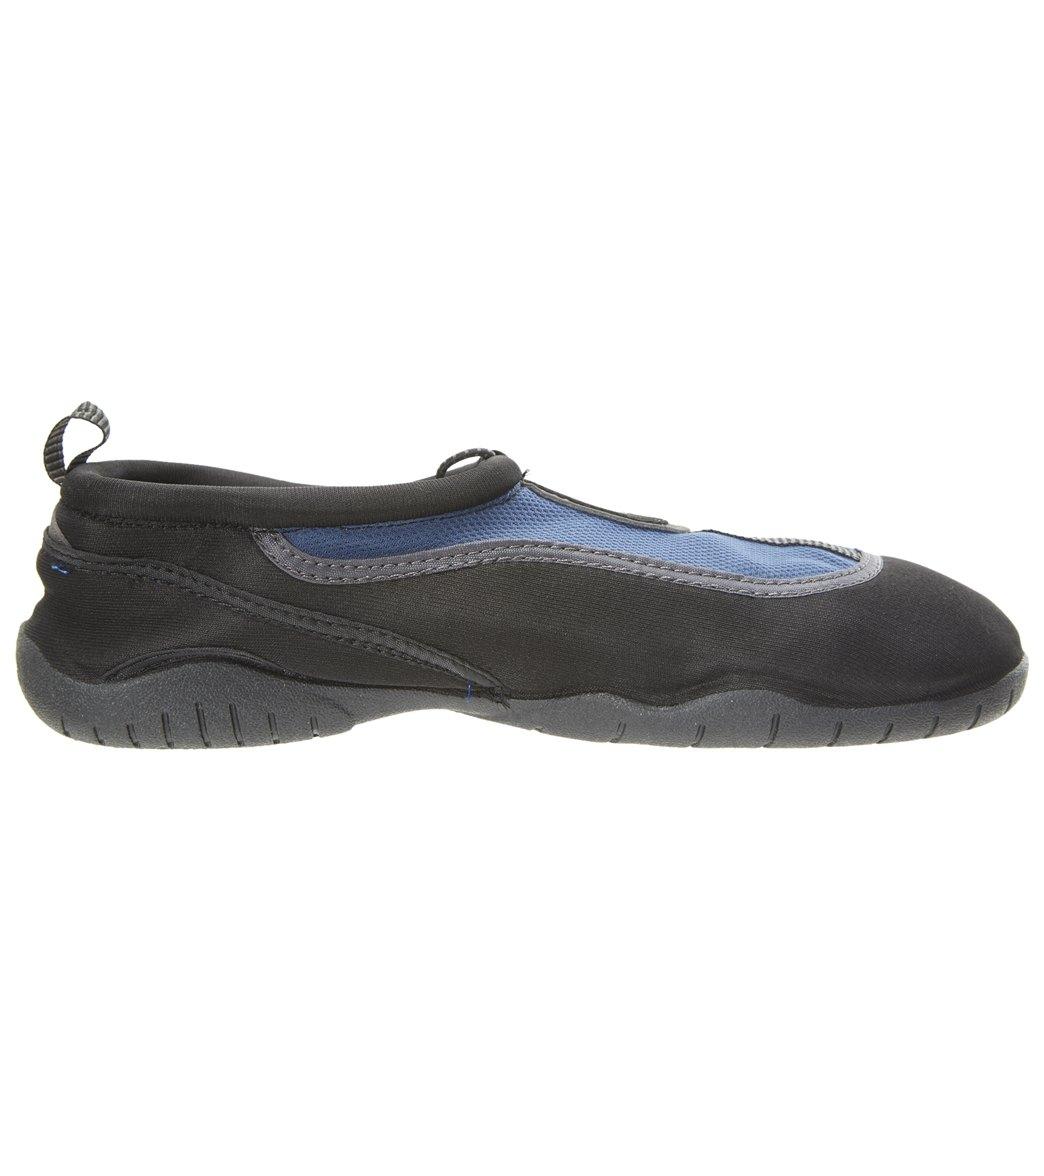 f28269ad0bdb Body Glove Men s Riptide III Water Shoe at SwimOutlet.com